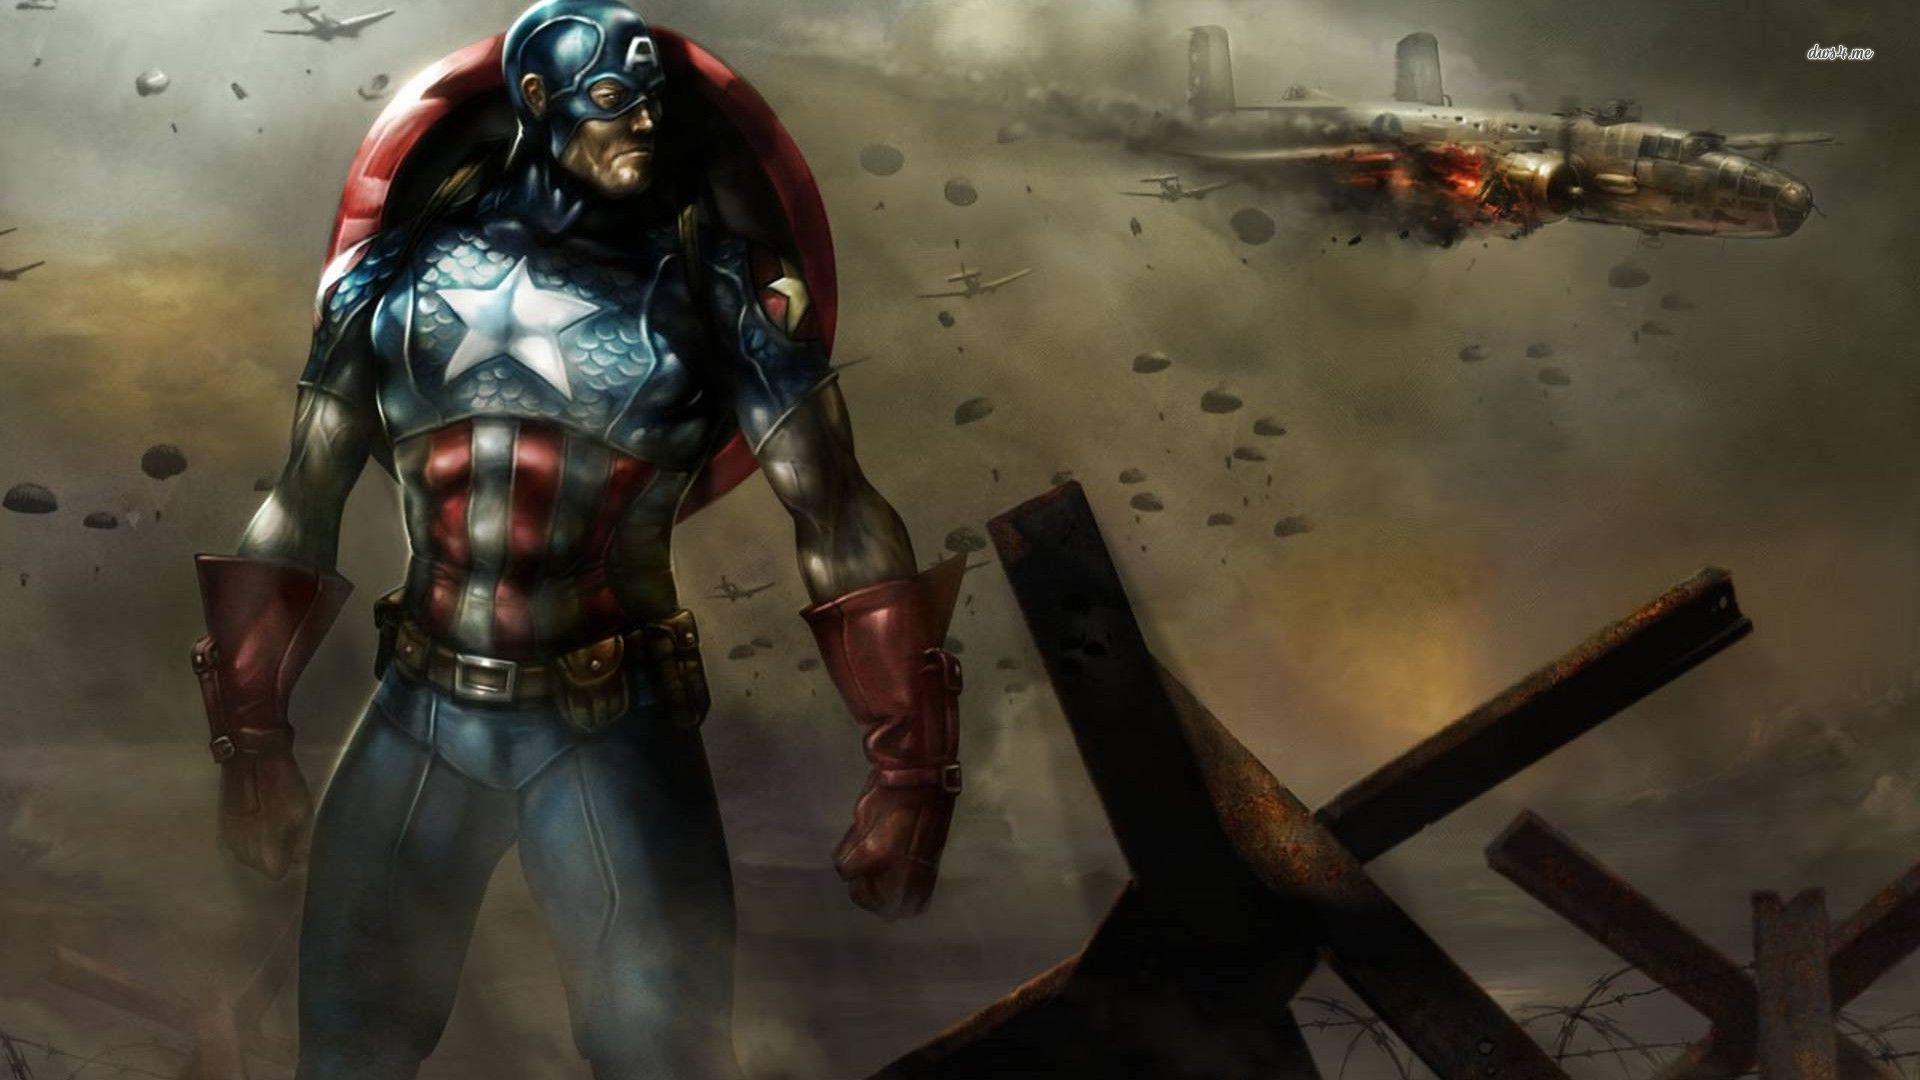 America wallpaper 1680x1050 Captain America wallpaper 1920x1080 more 1920x1080